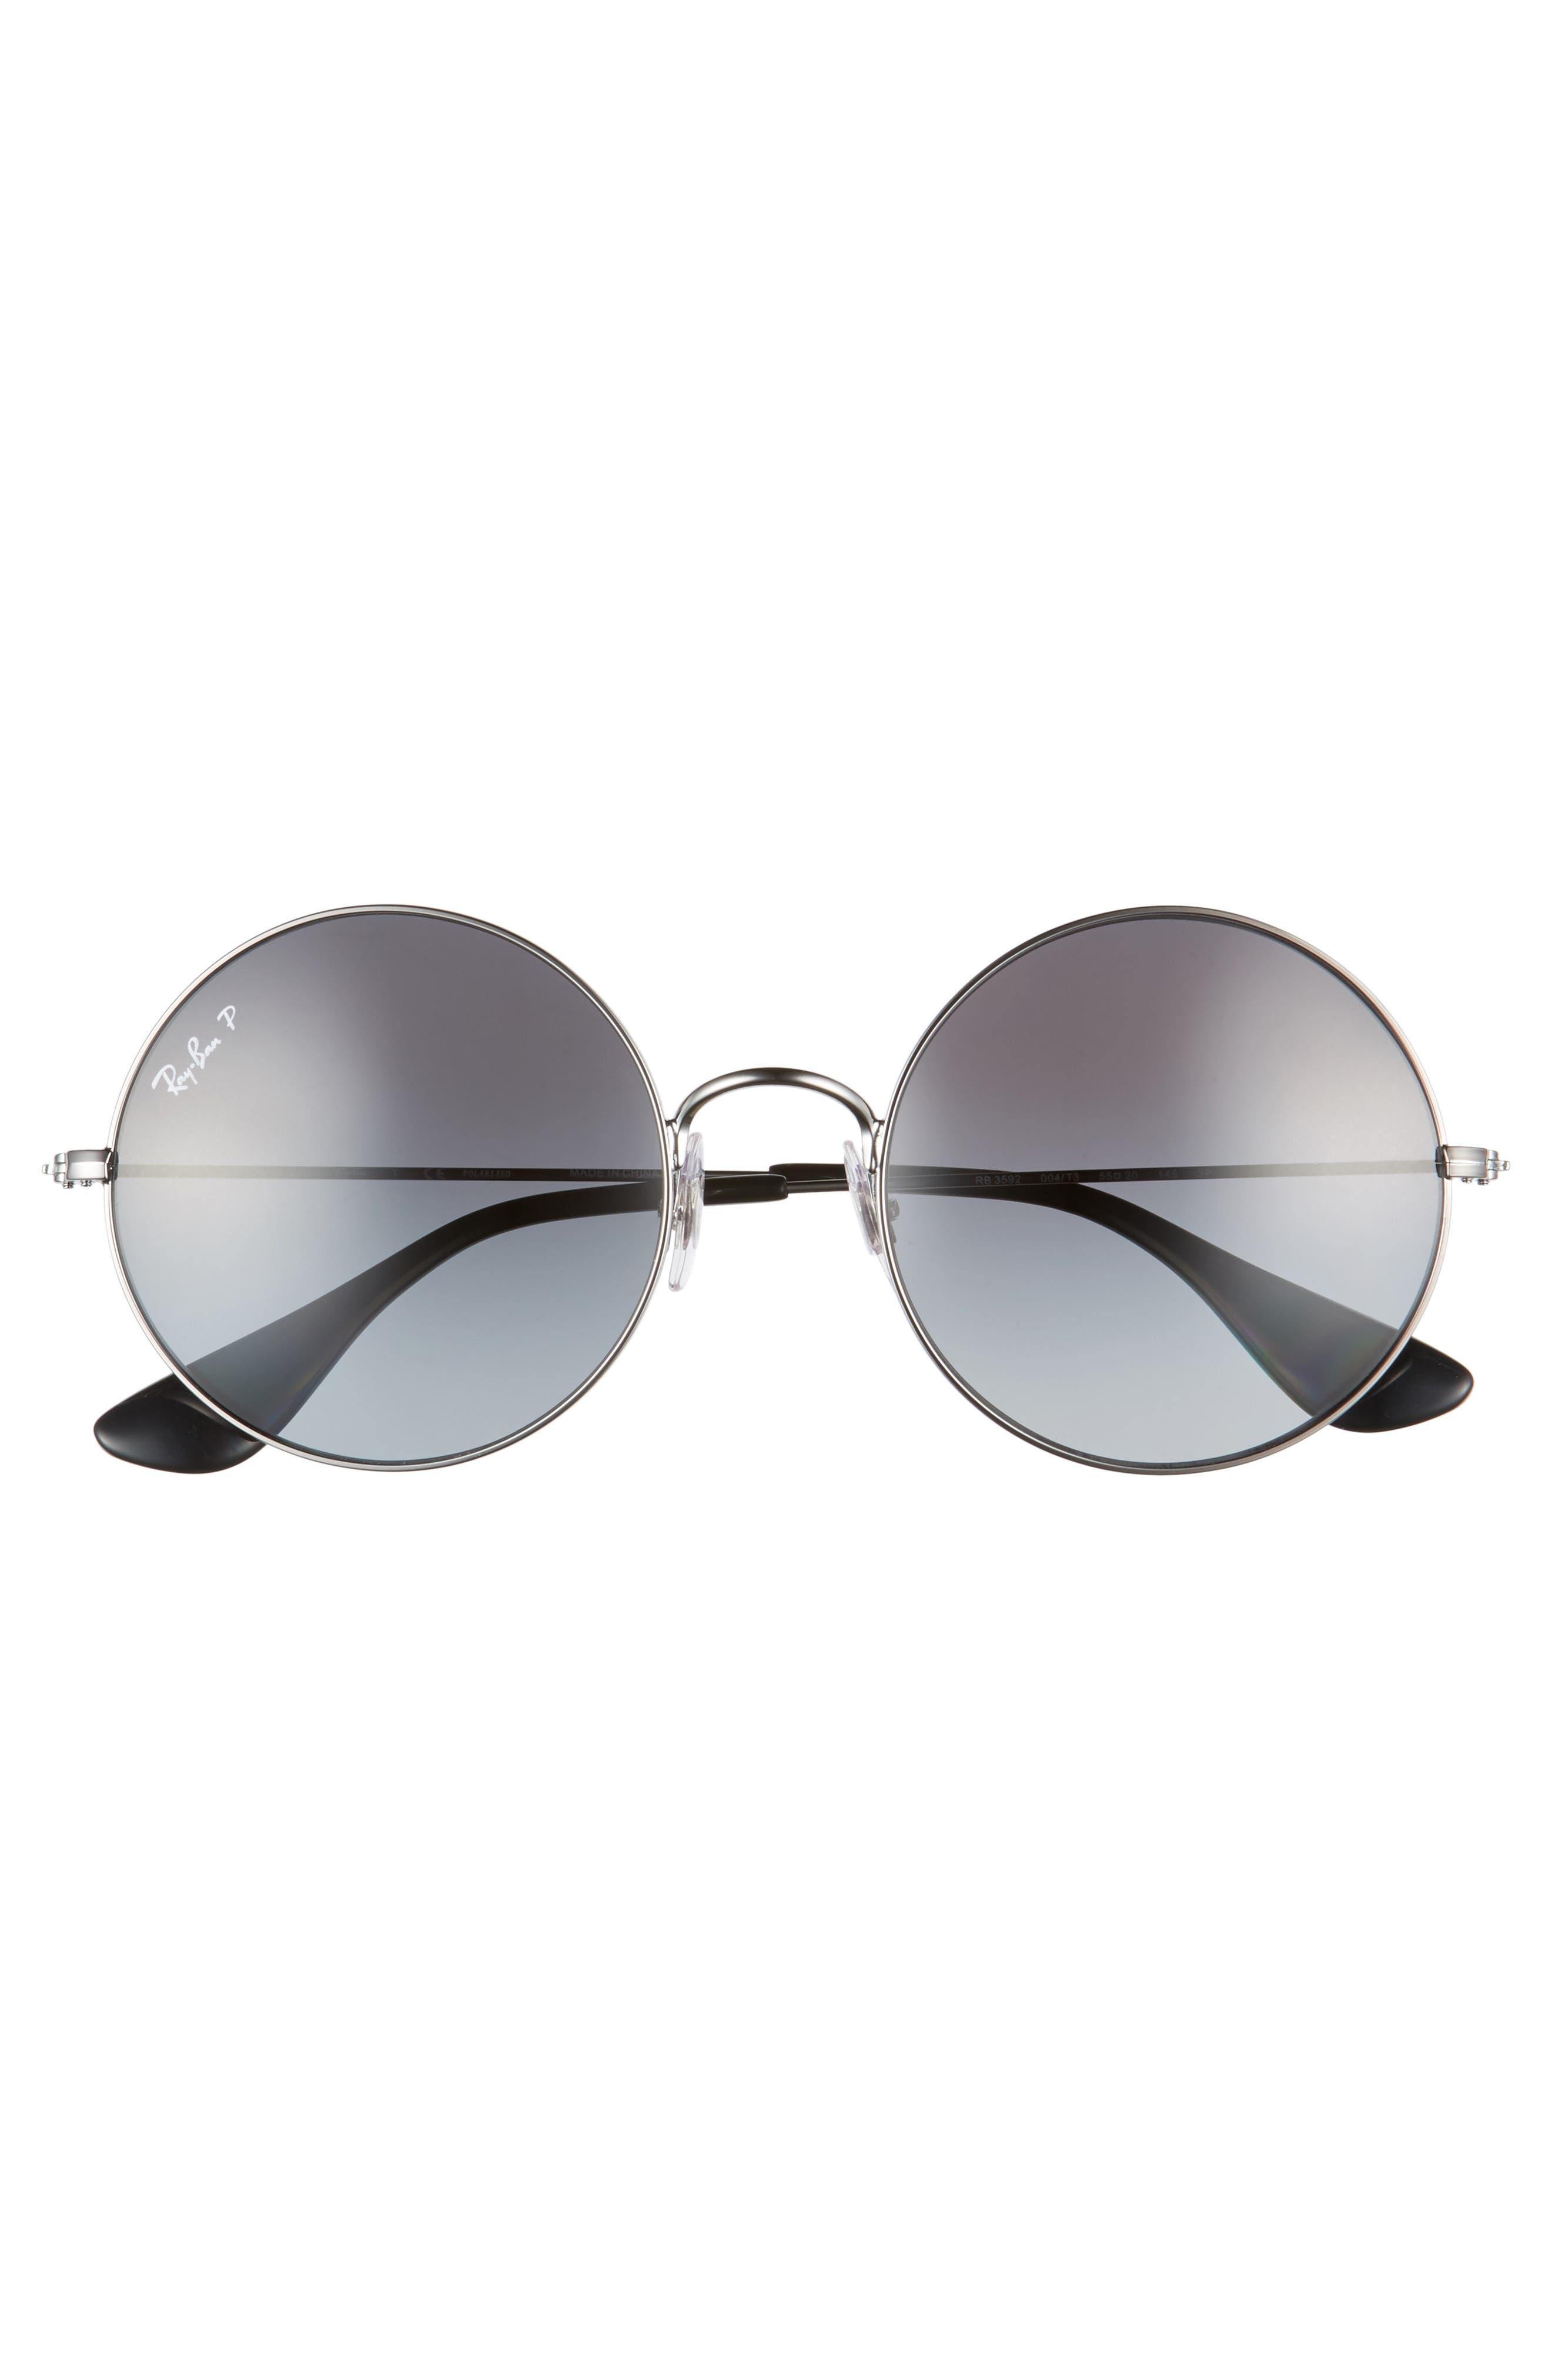 55mm Polarized Round Sunglasses,                             Alternate thumbnail 3, color,                             020